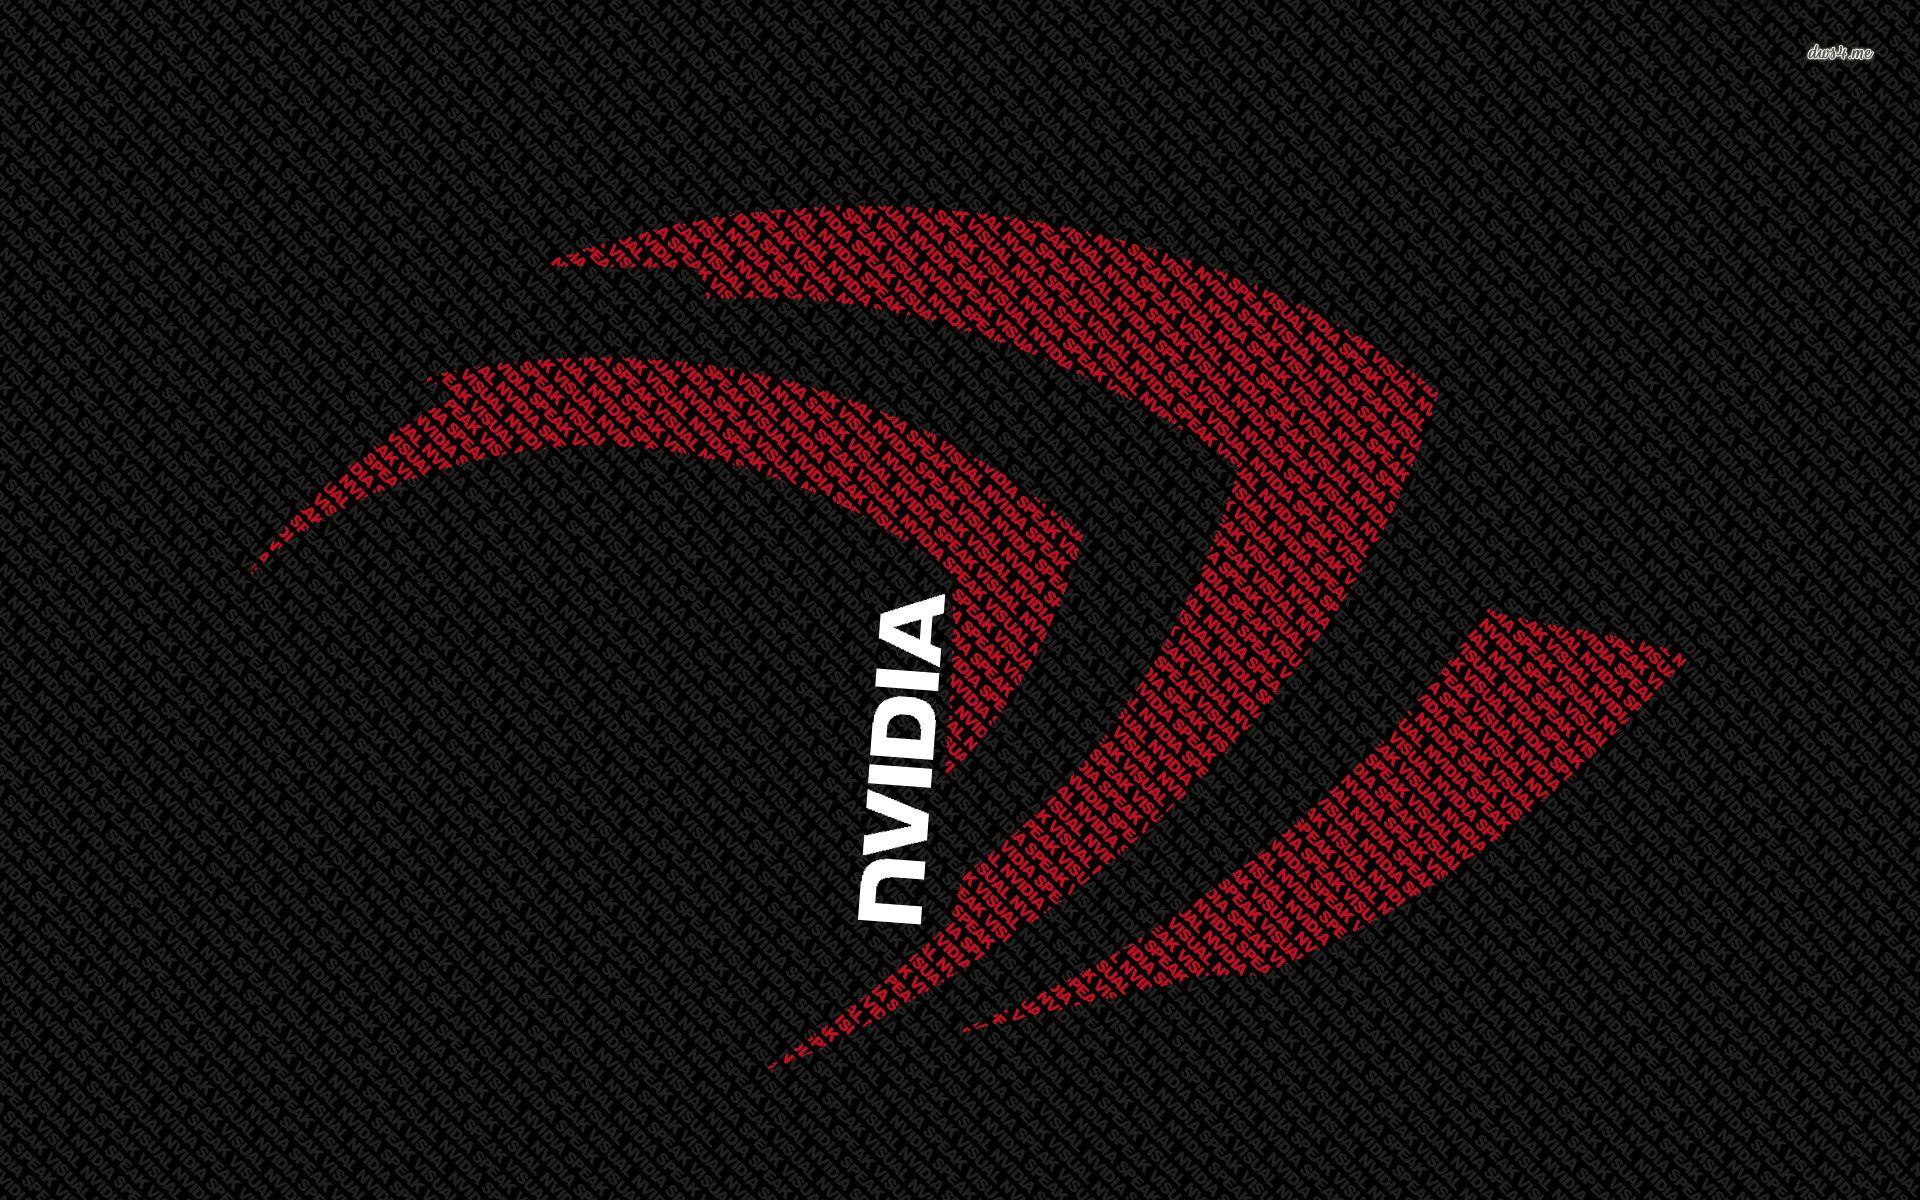 Red Nvidia Hd Wallpaper Id 1212 Download Page Geforce Wallpaper Papel De Parede Vermelho Logotipo